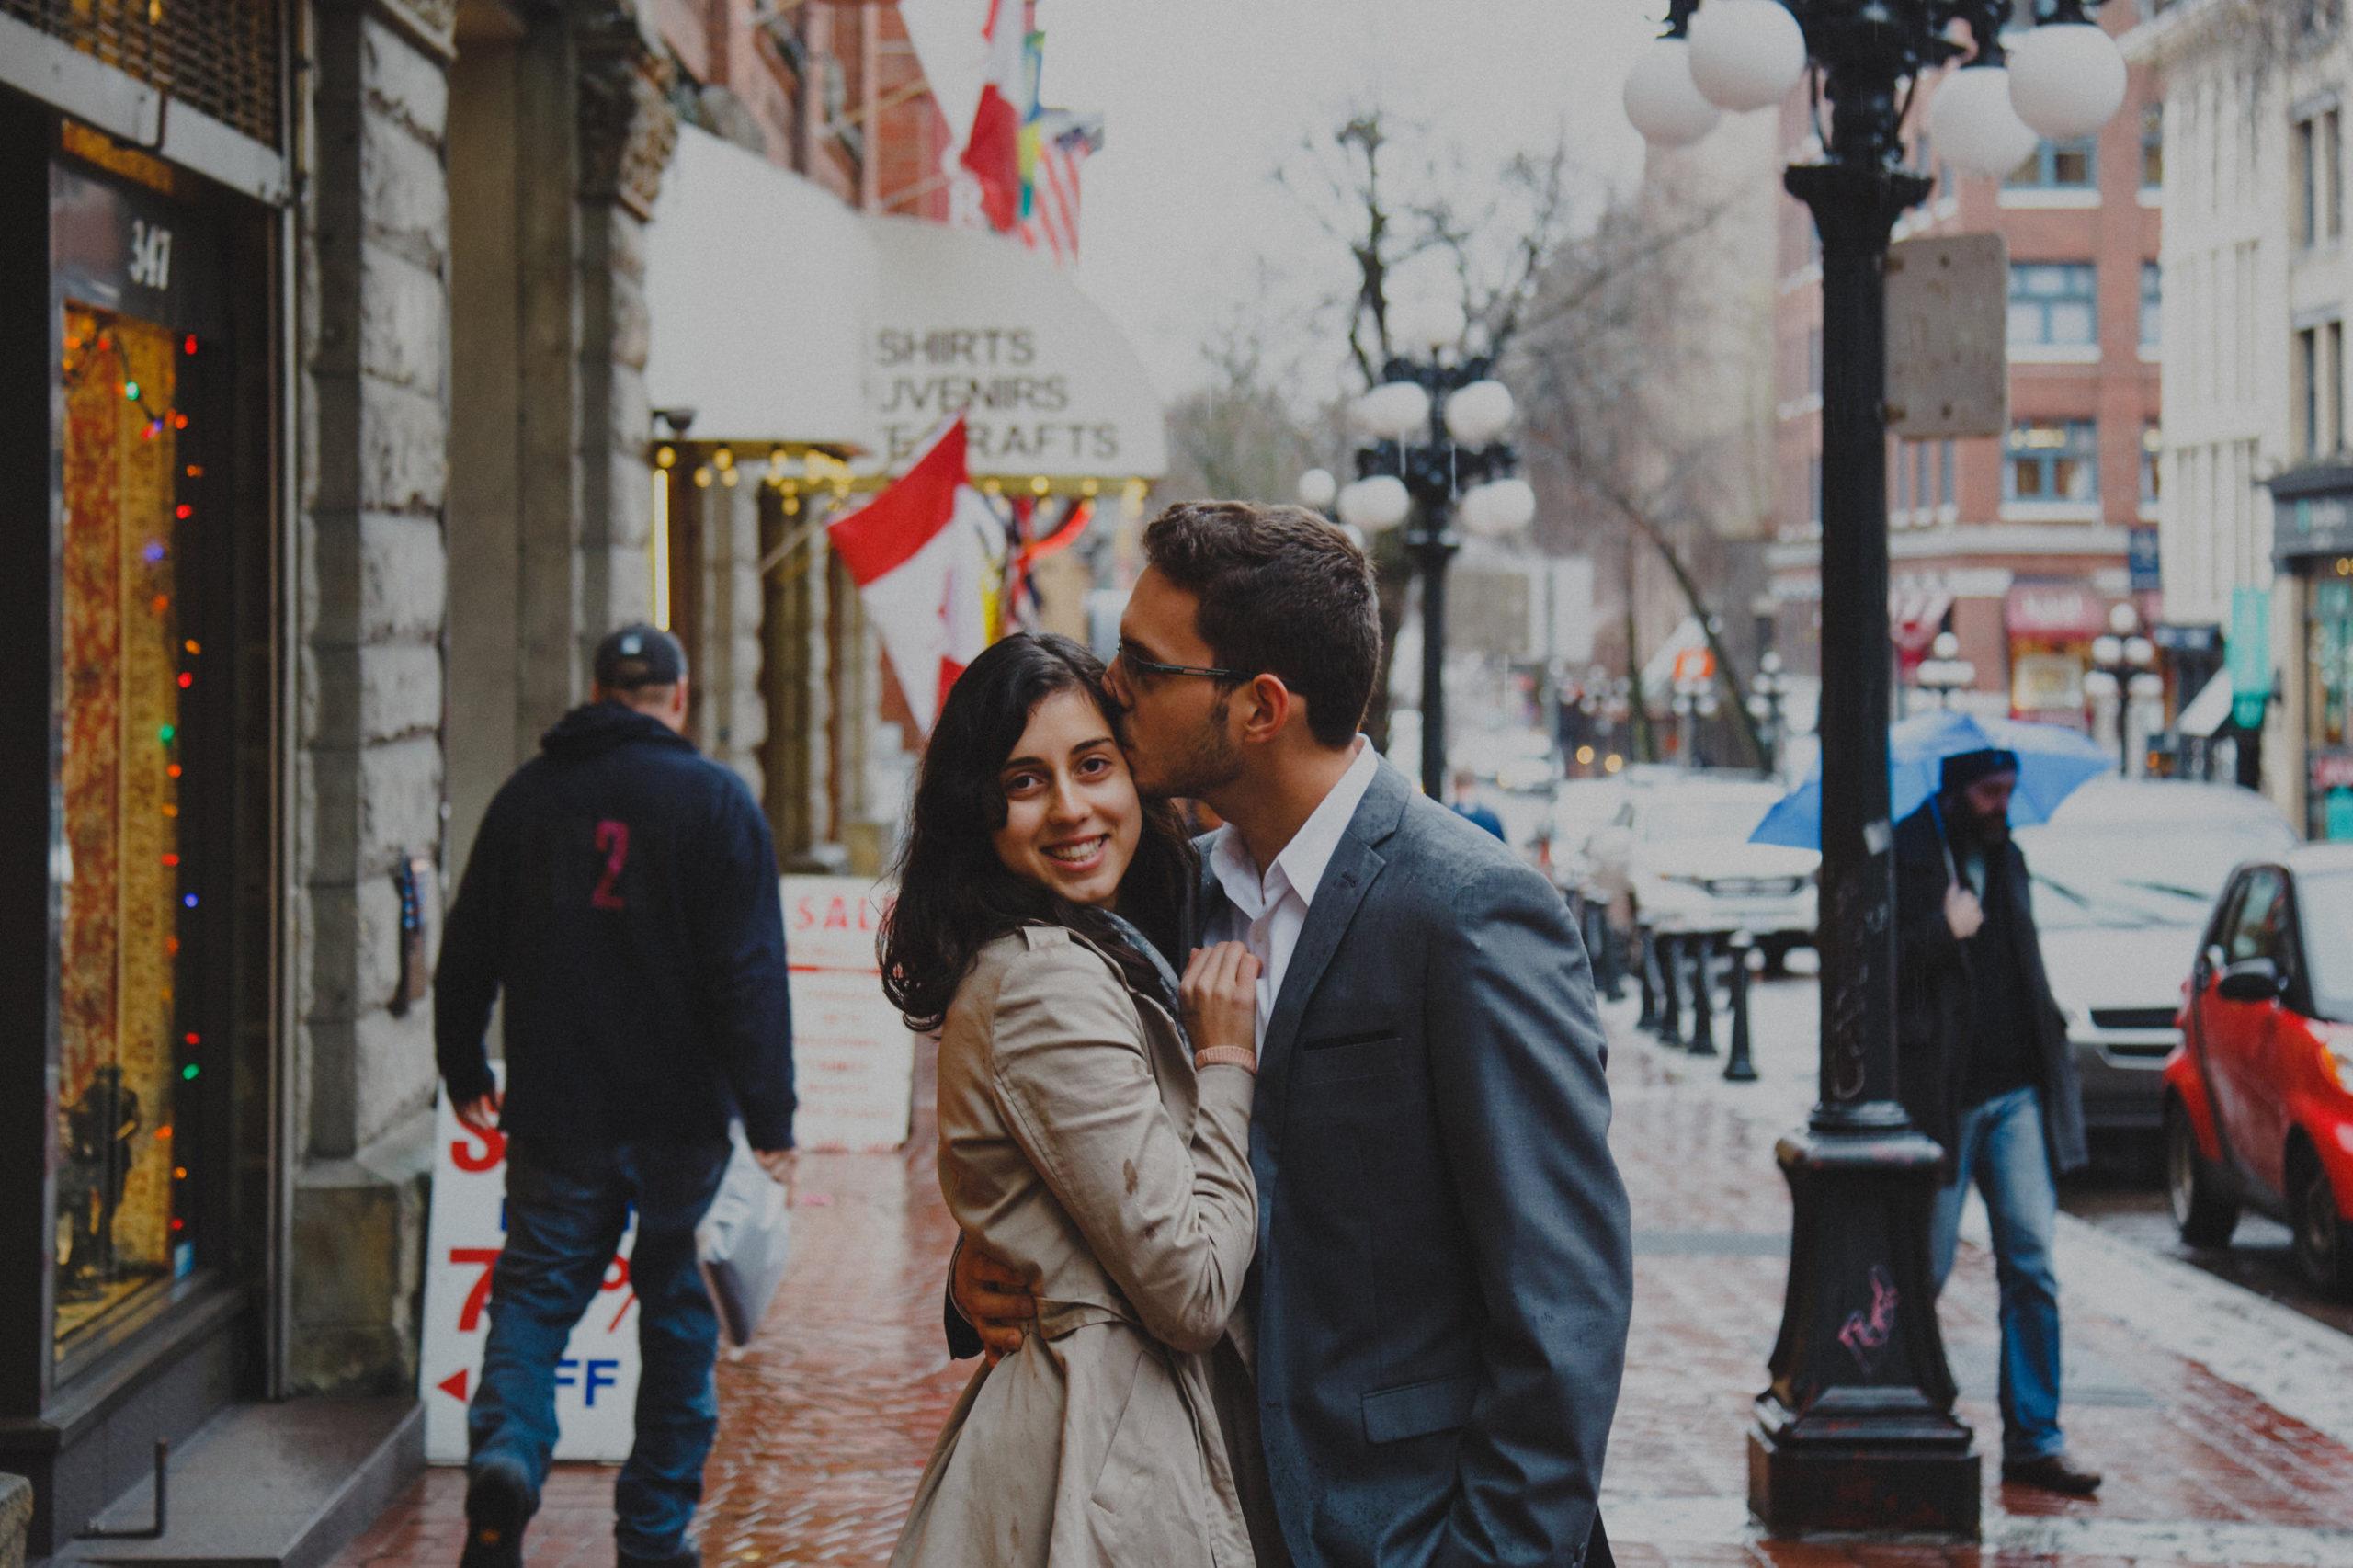 Man kisses wife on cheek on sidewalk in Gastown